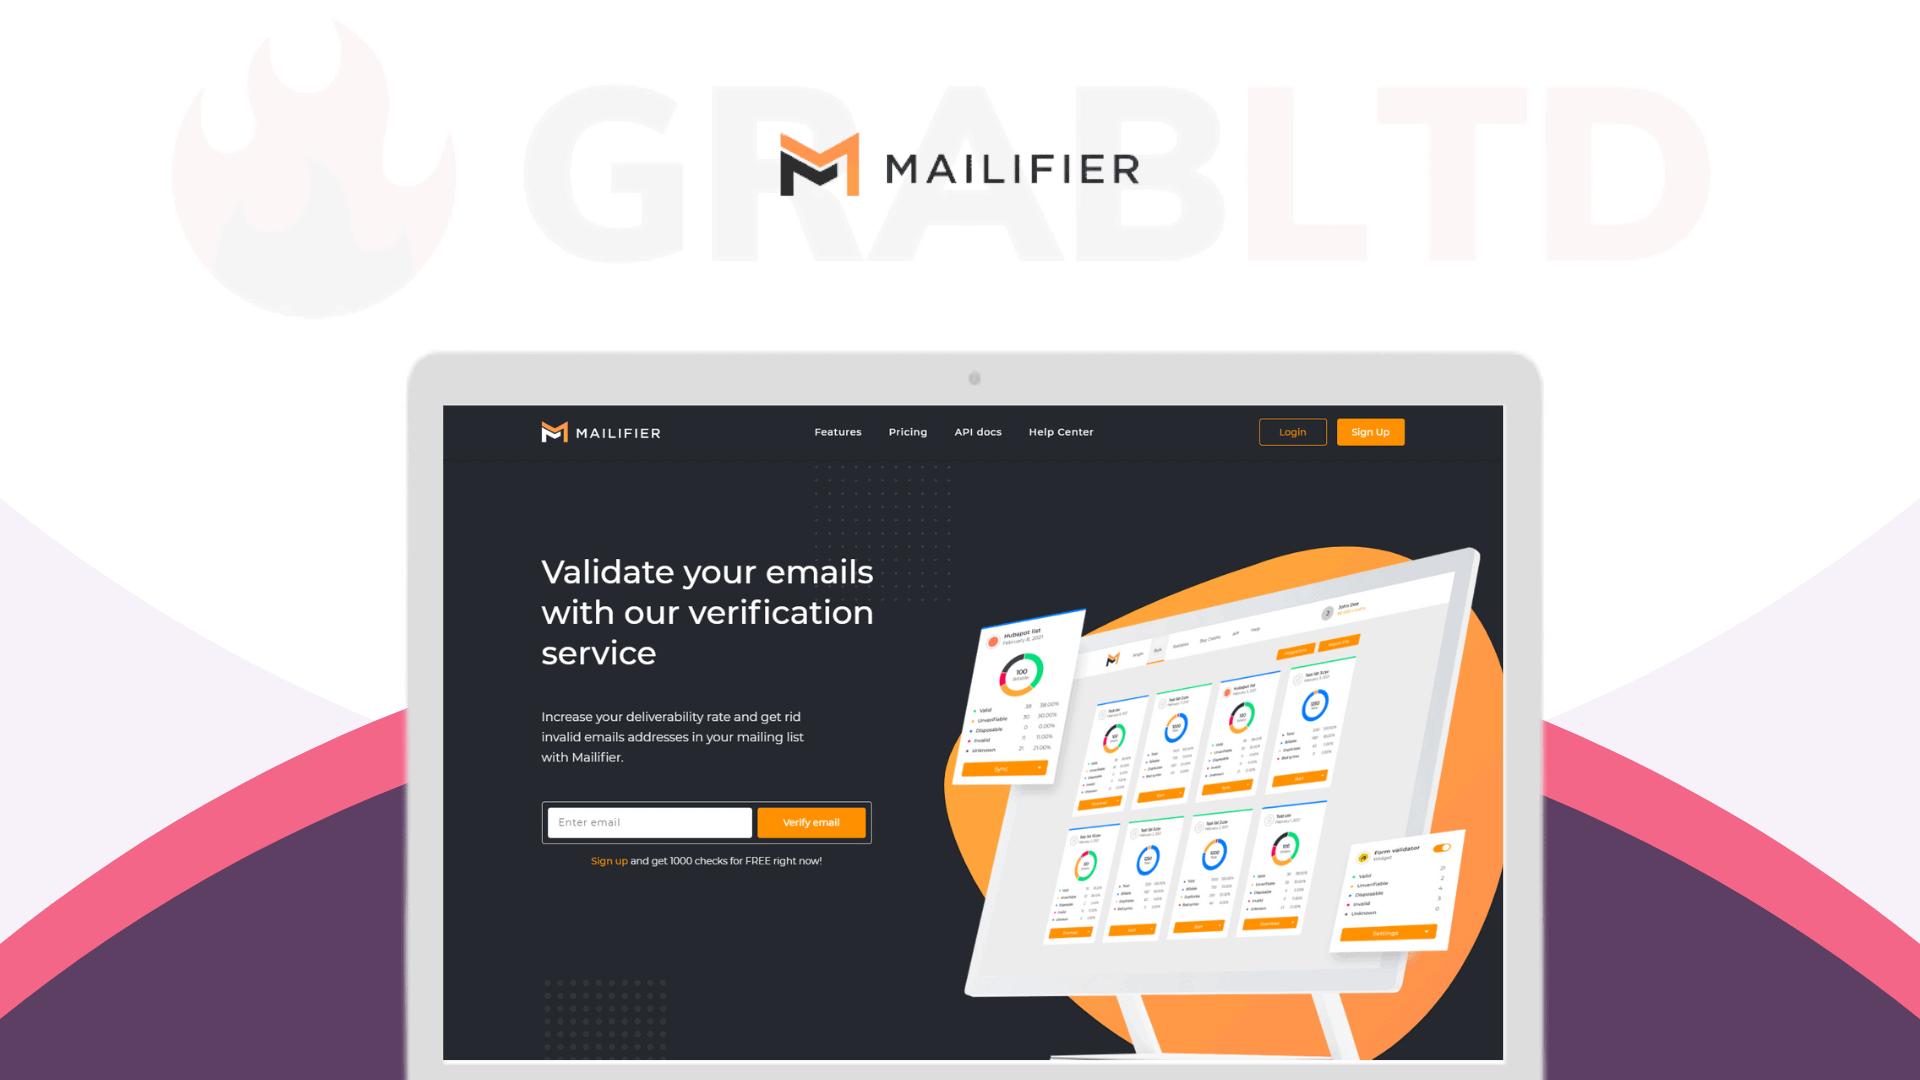 Mailifier Lifetime Software Deal